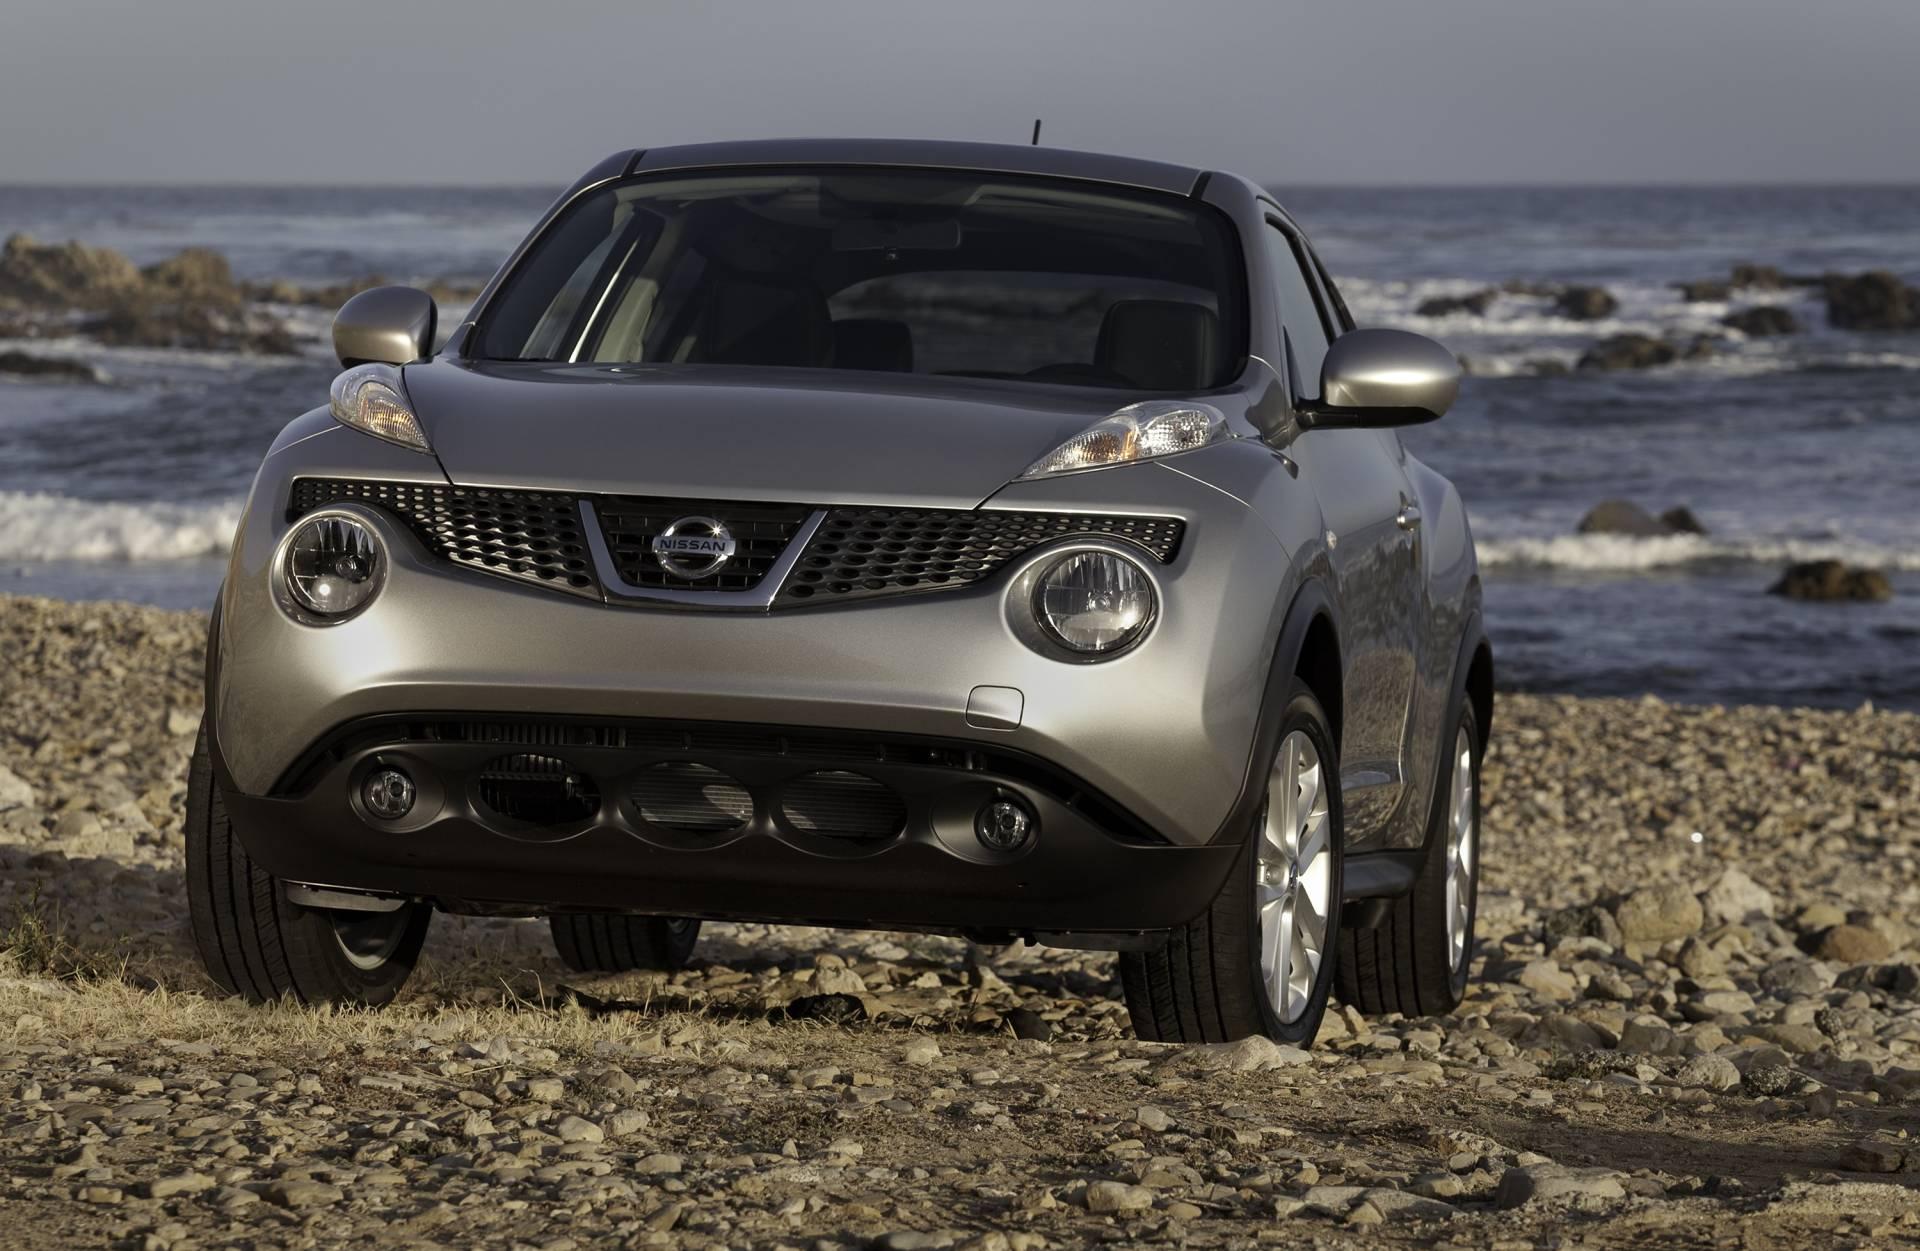 2013 Nissan Juke News And Information Conceptcarzcom